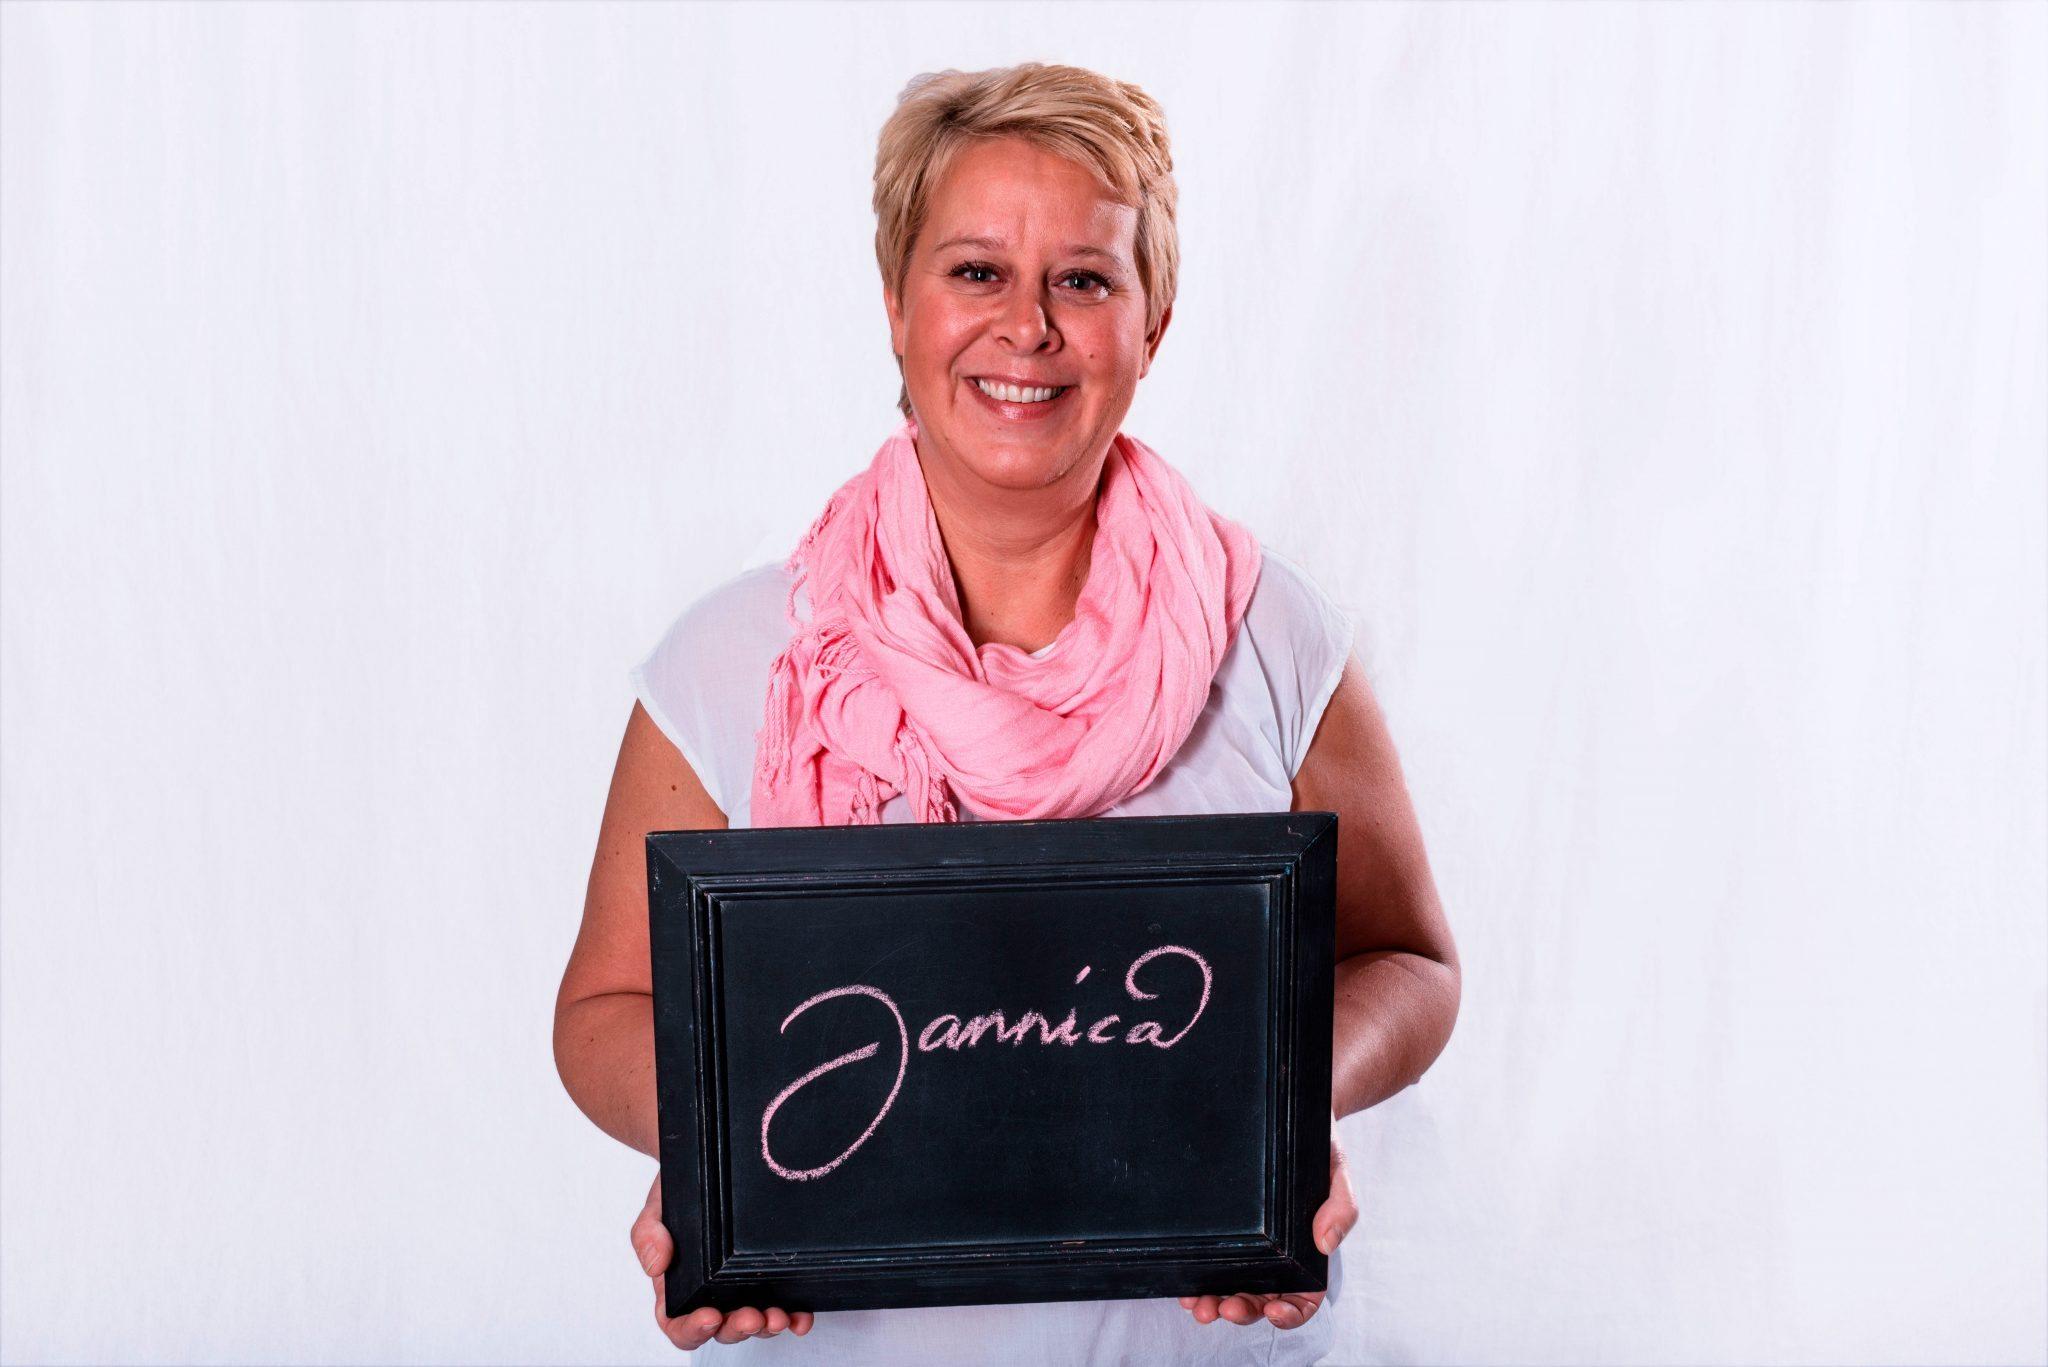 Jannica Wiik